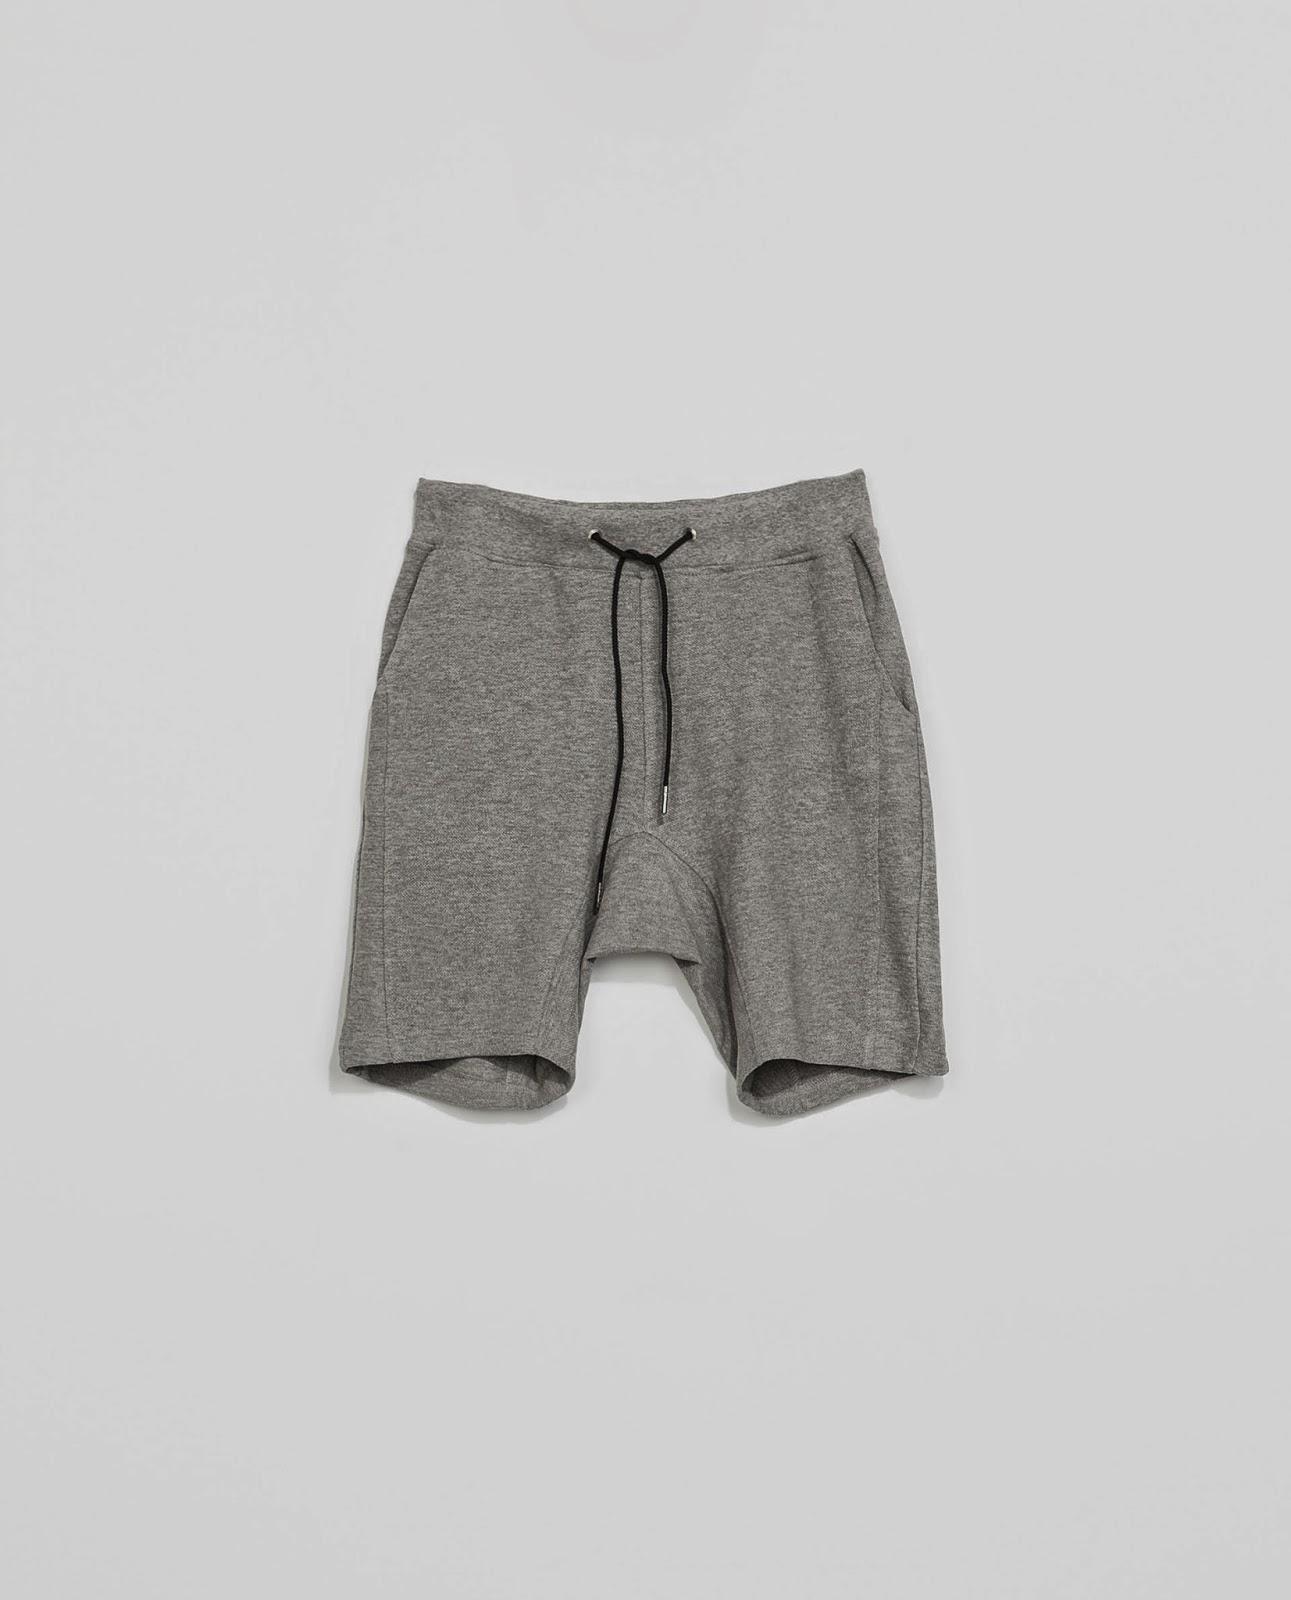 Bermuda algodón, gris, grey, Zara Men